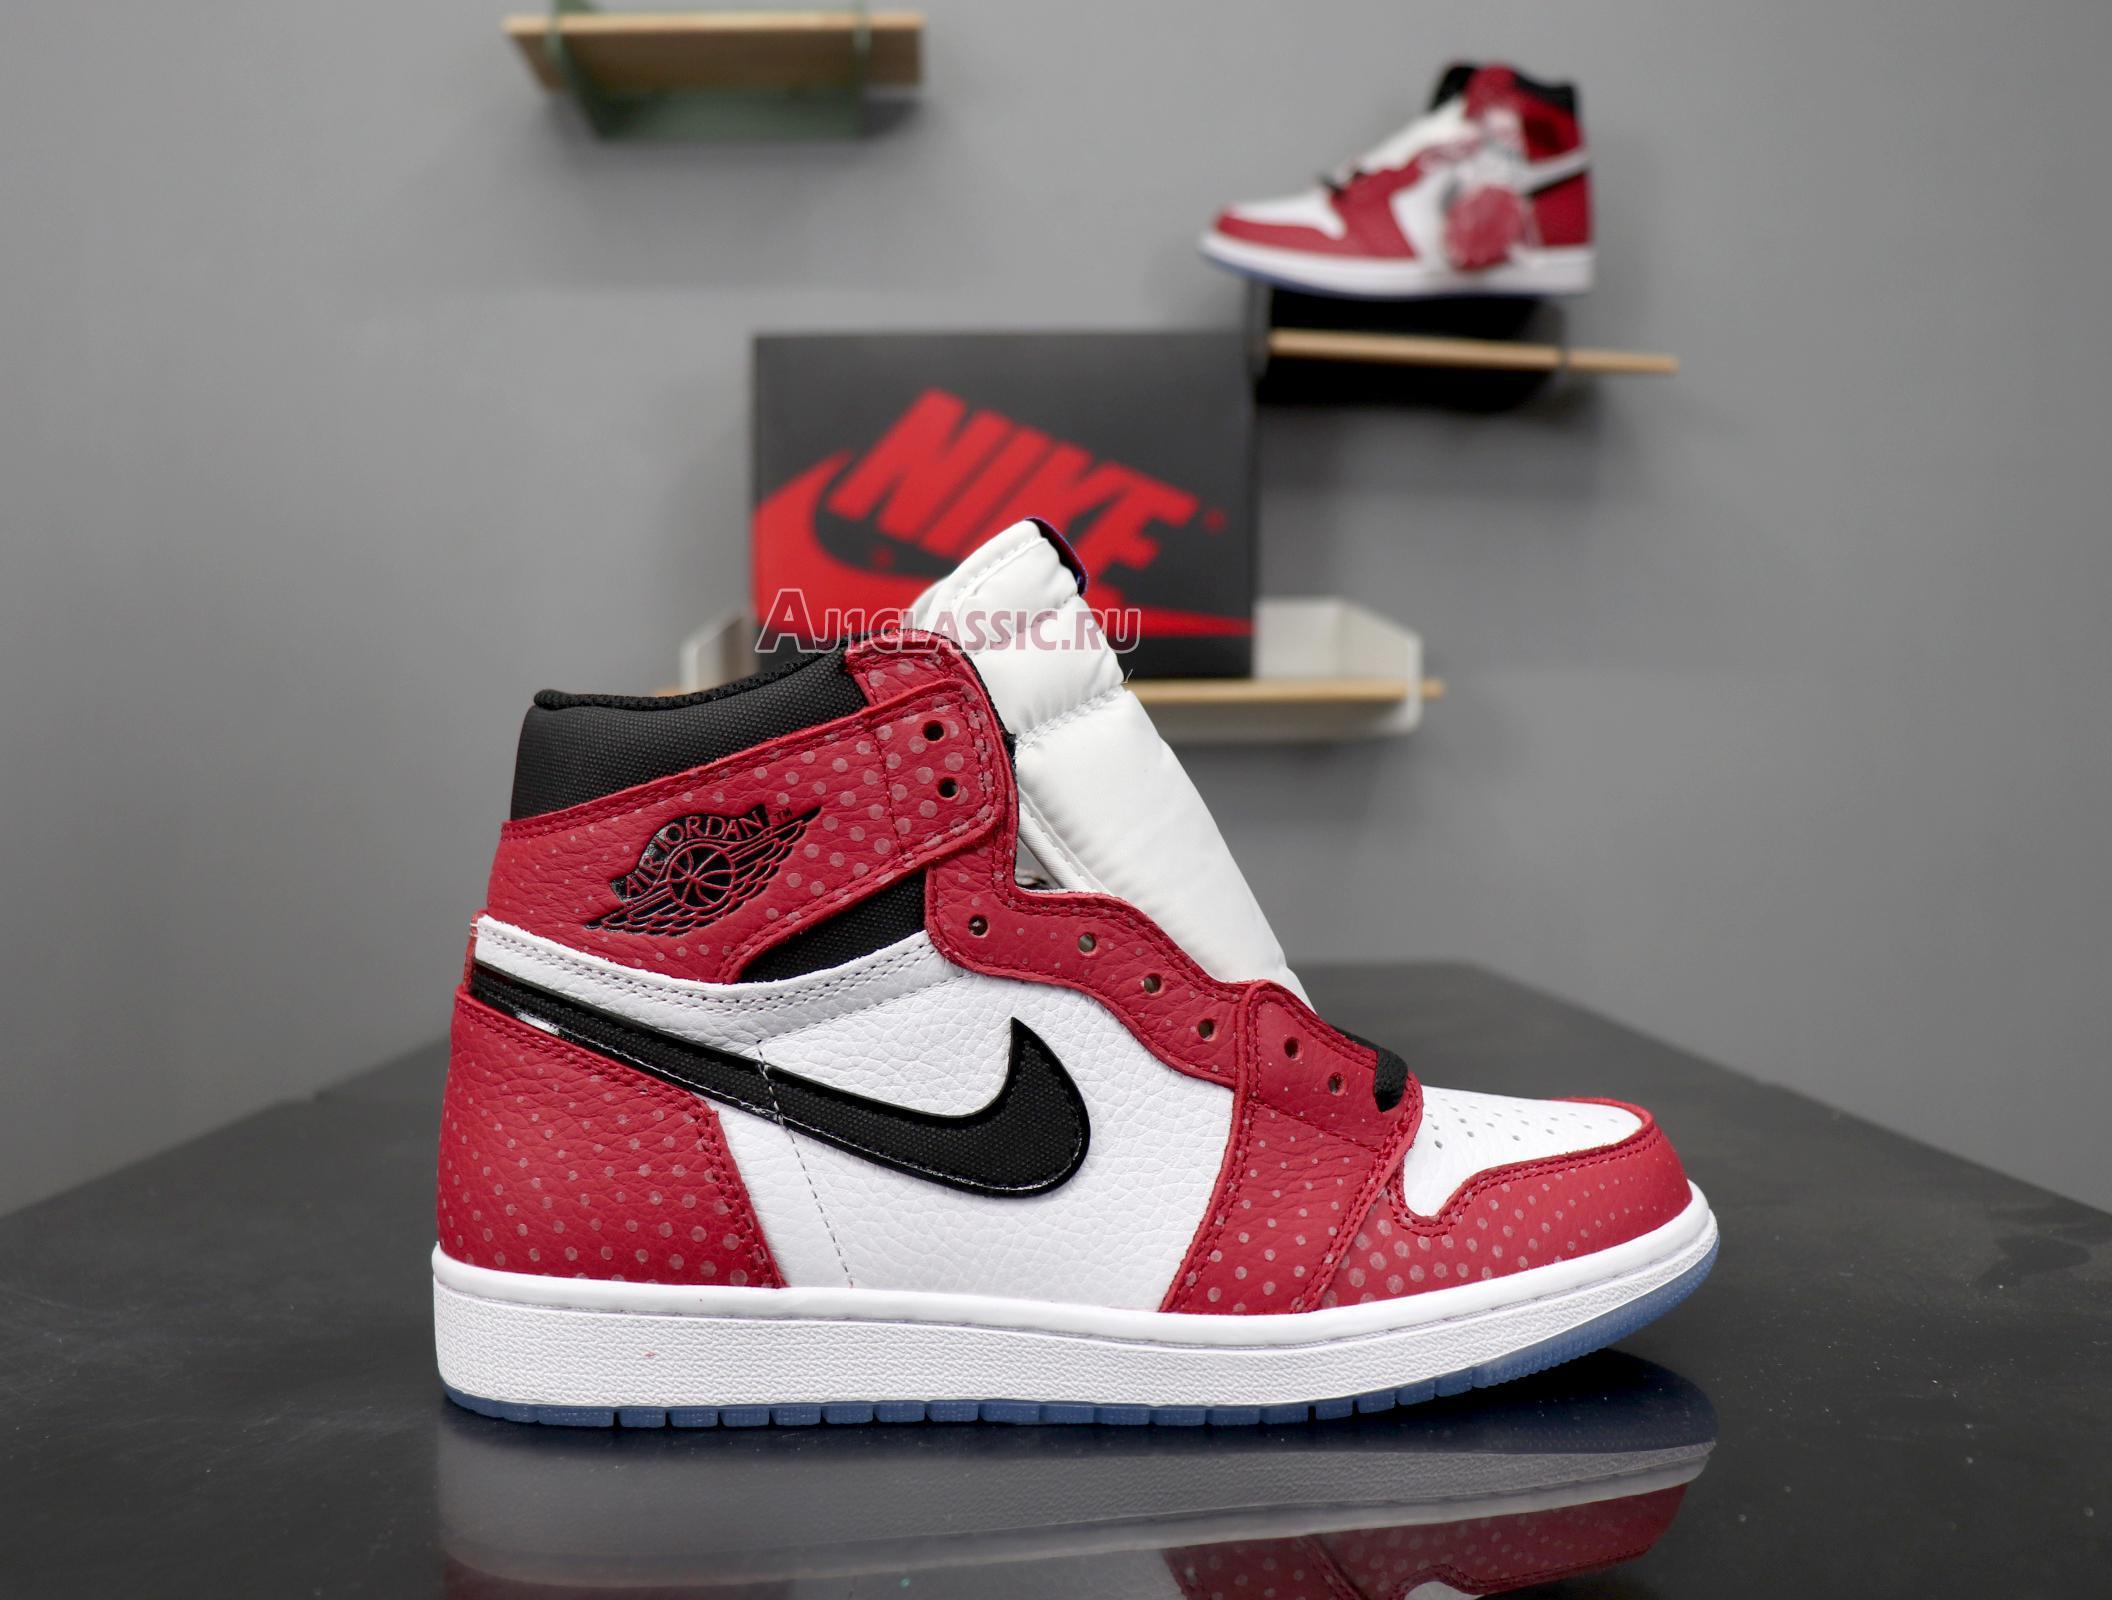 "Air Jordan 1 Retro High OG ""Origin Story"" 555088-602"